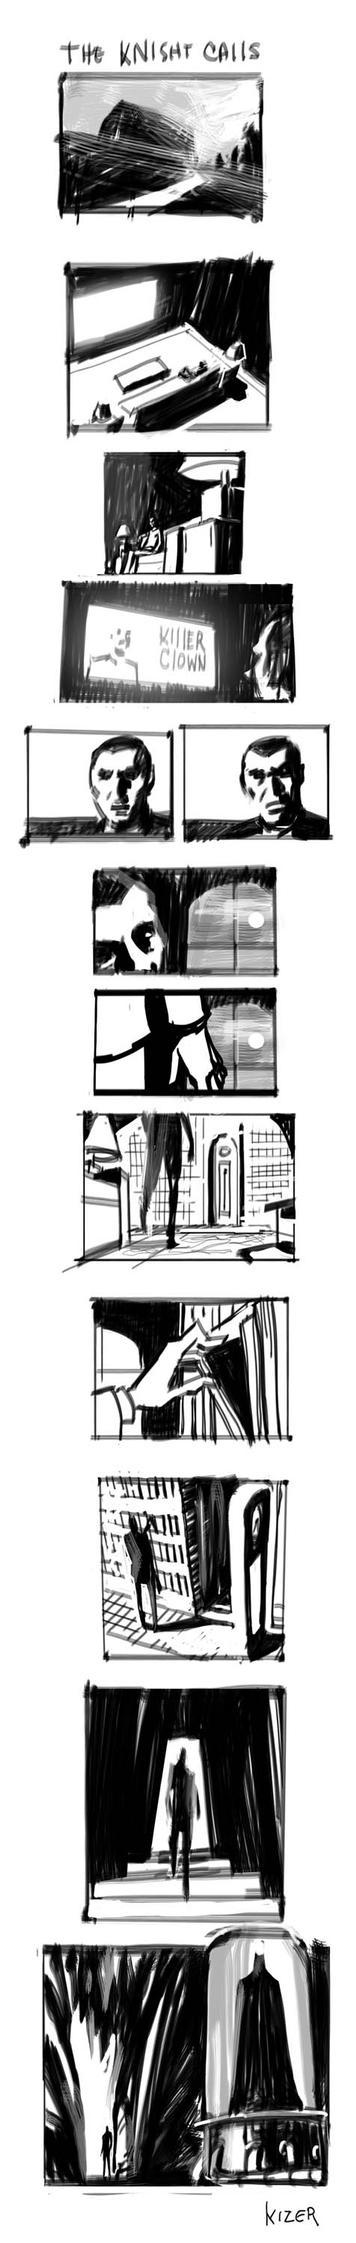 The Knight Calls by CoranKizerStone